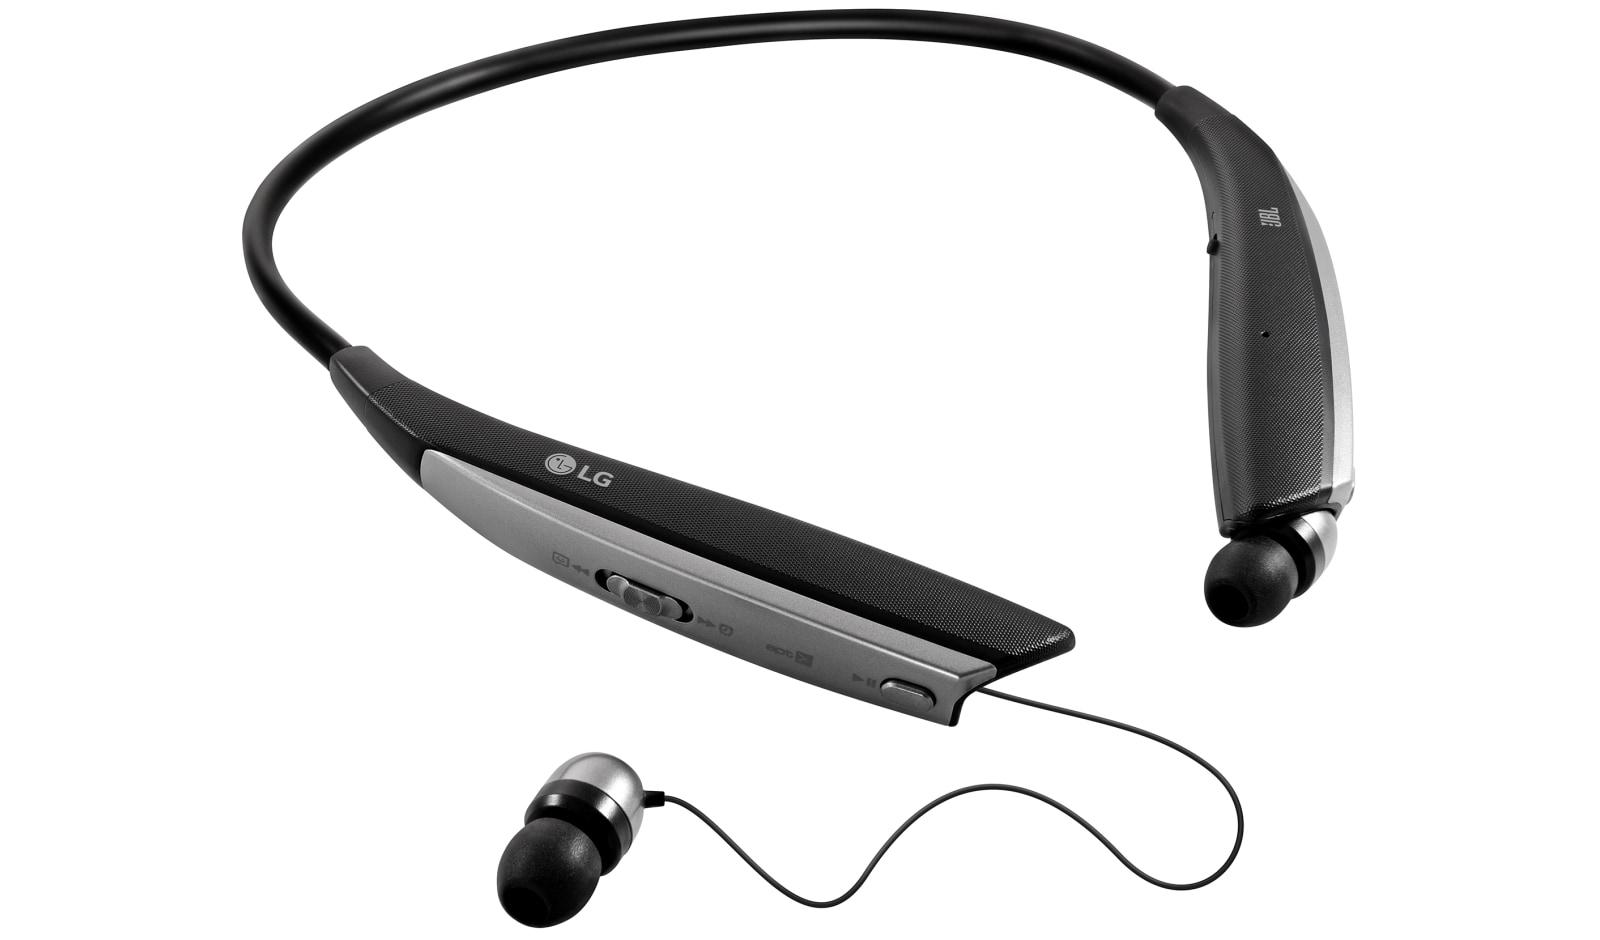 eeca0c000f5 LG TONE ULTRA™ Premium Wireless Stereo Headset | LG Canada